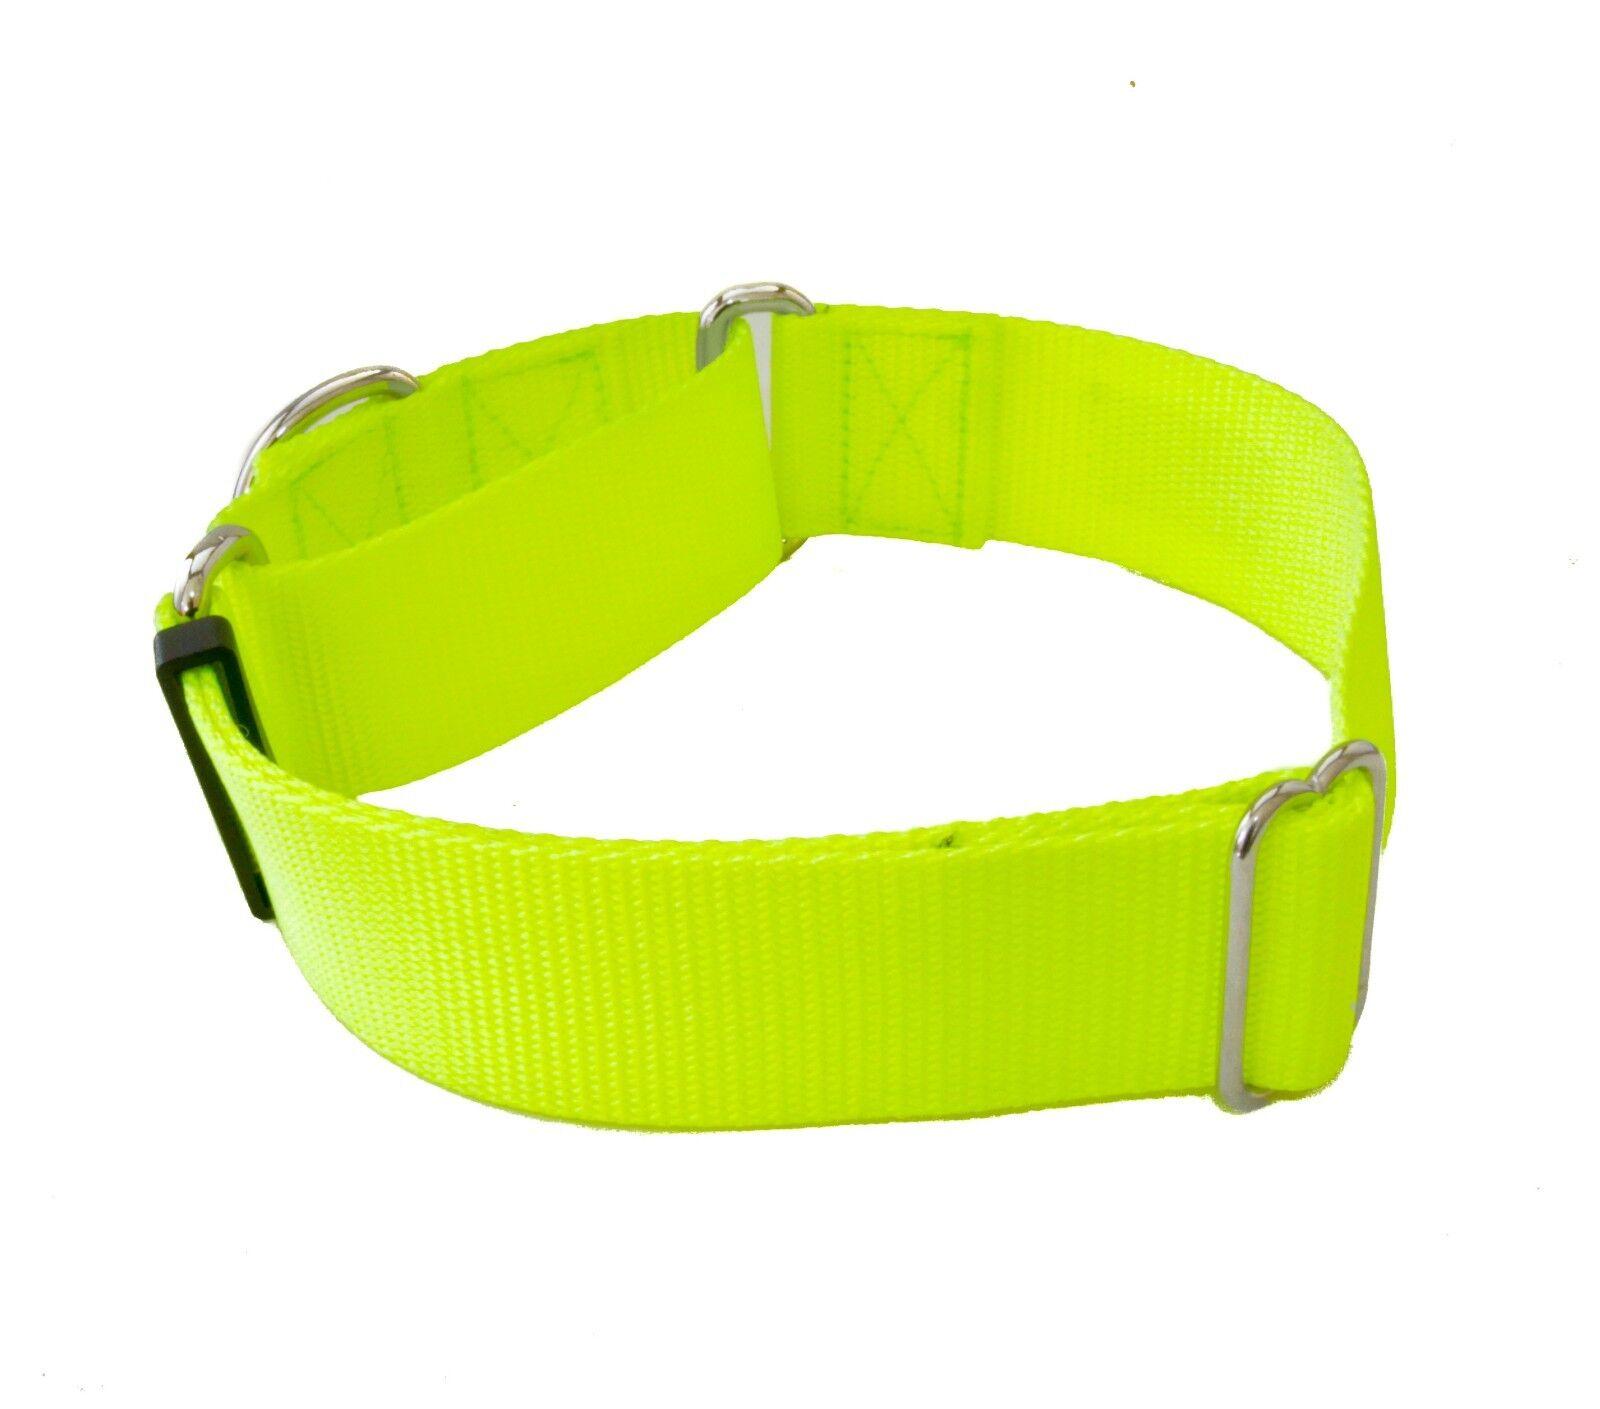 1.5 Inch Width Martingale No Slip Dog Collars - Heavy Duty 1